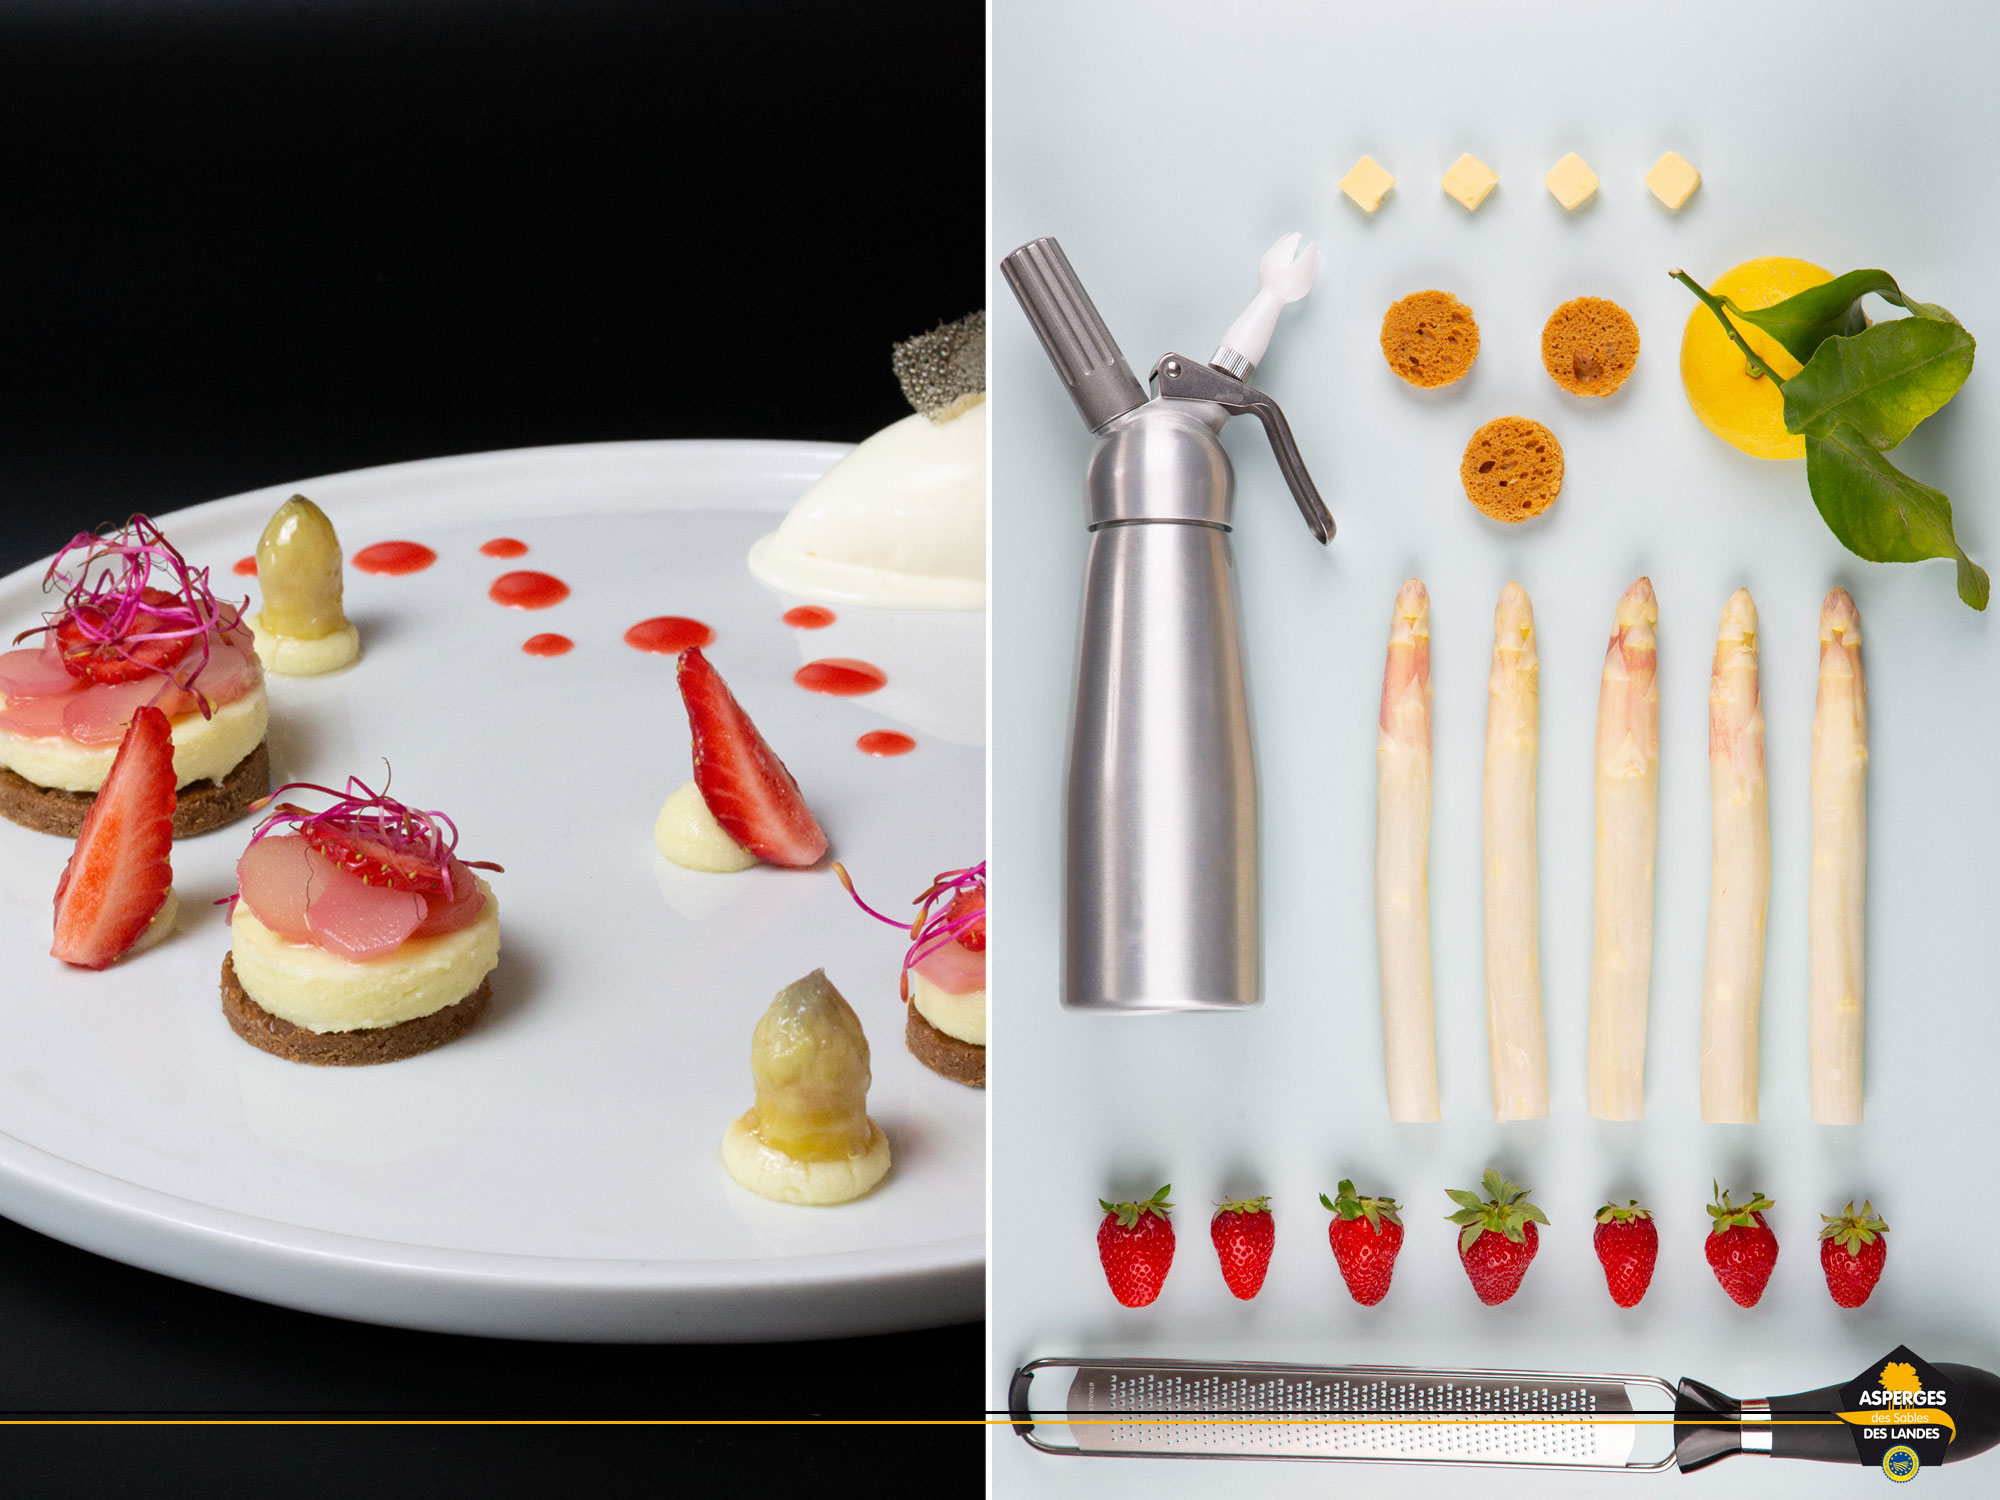 Recette Asperge des Sables des Landes version dessert